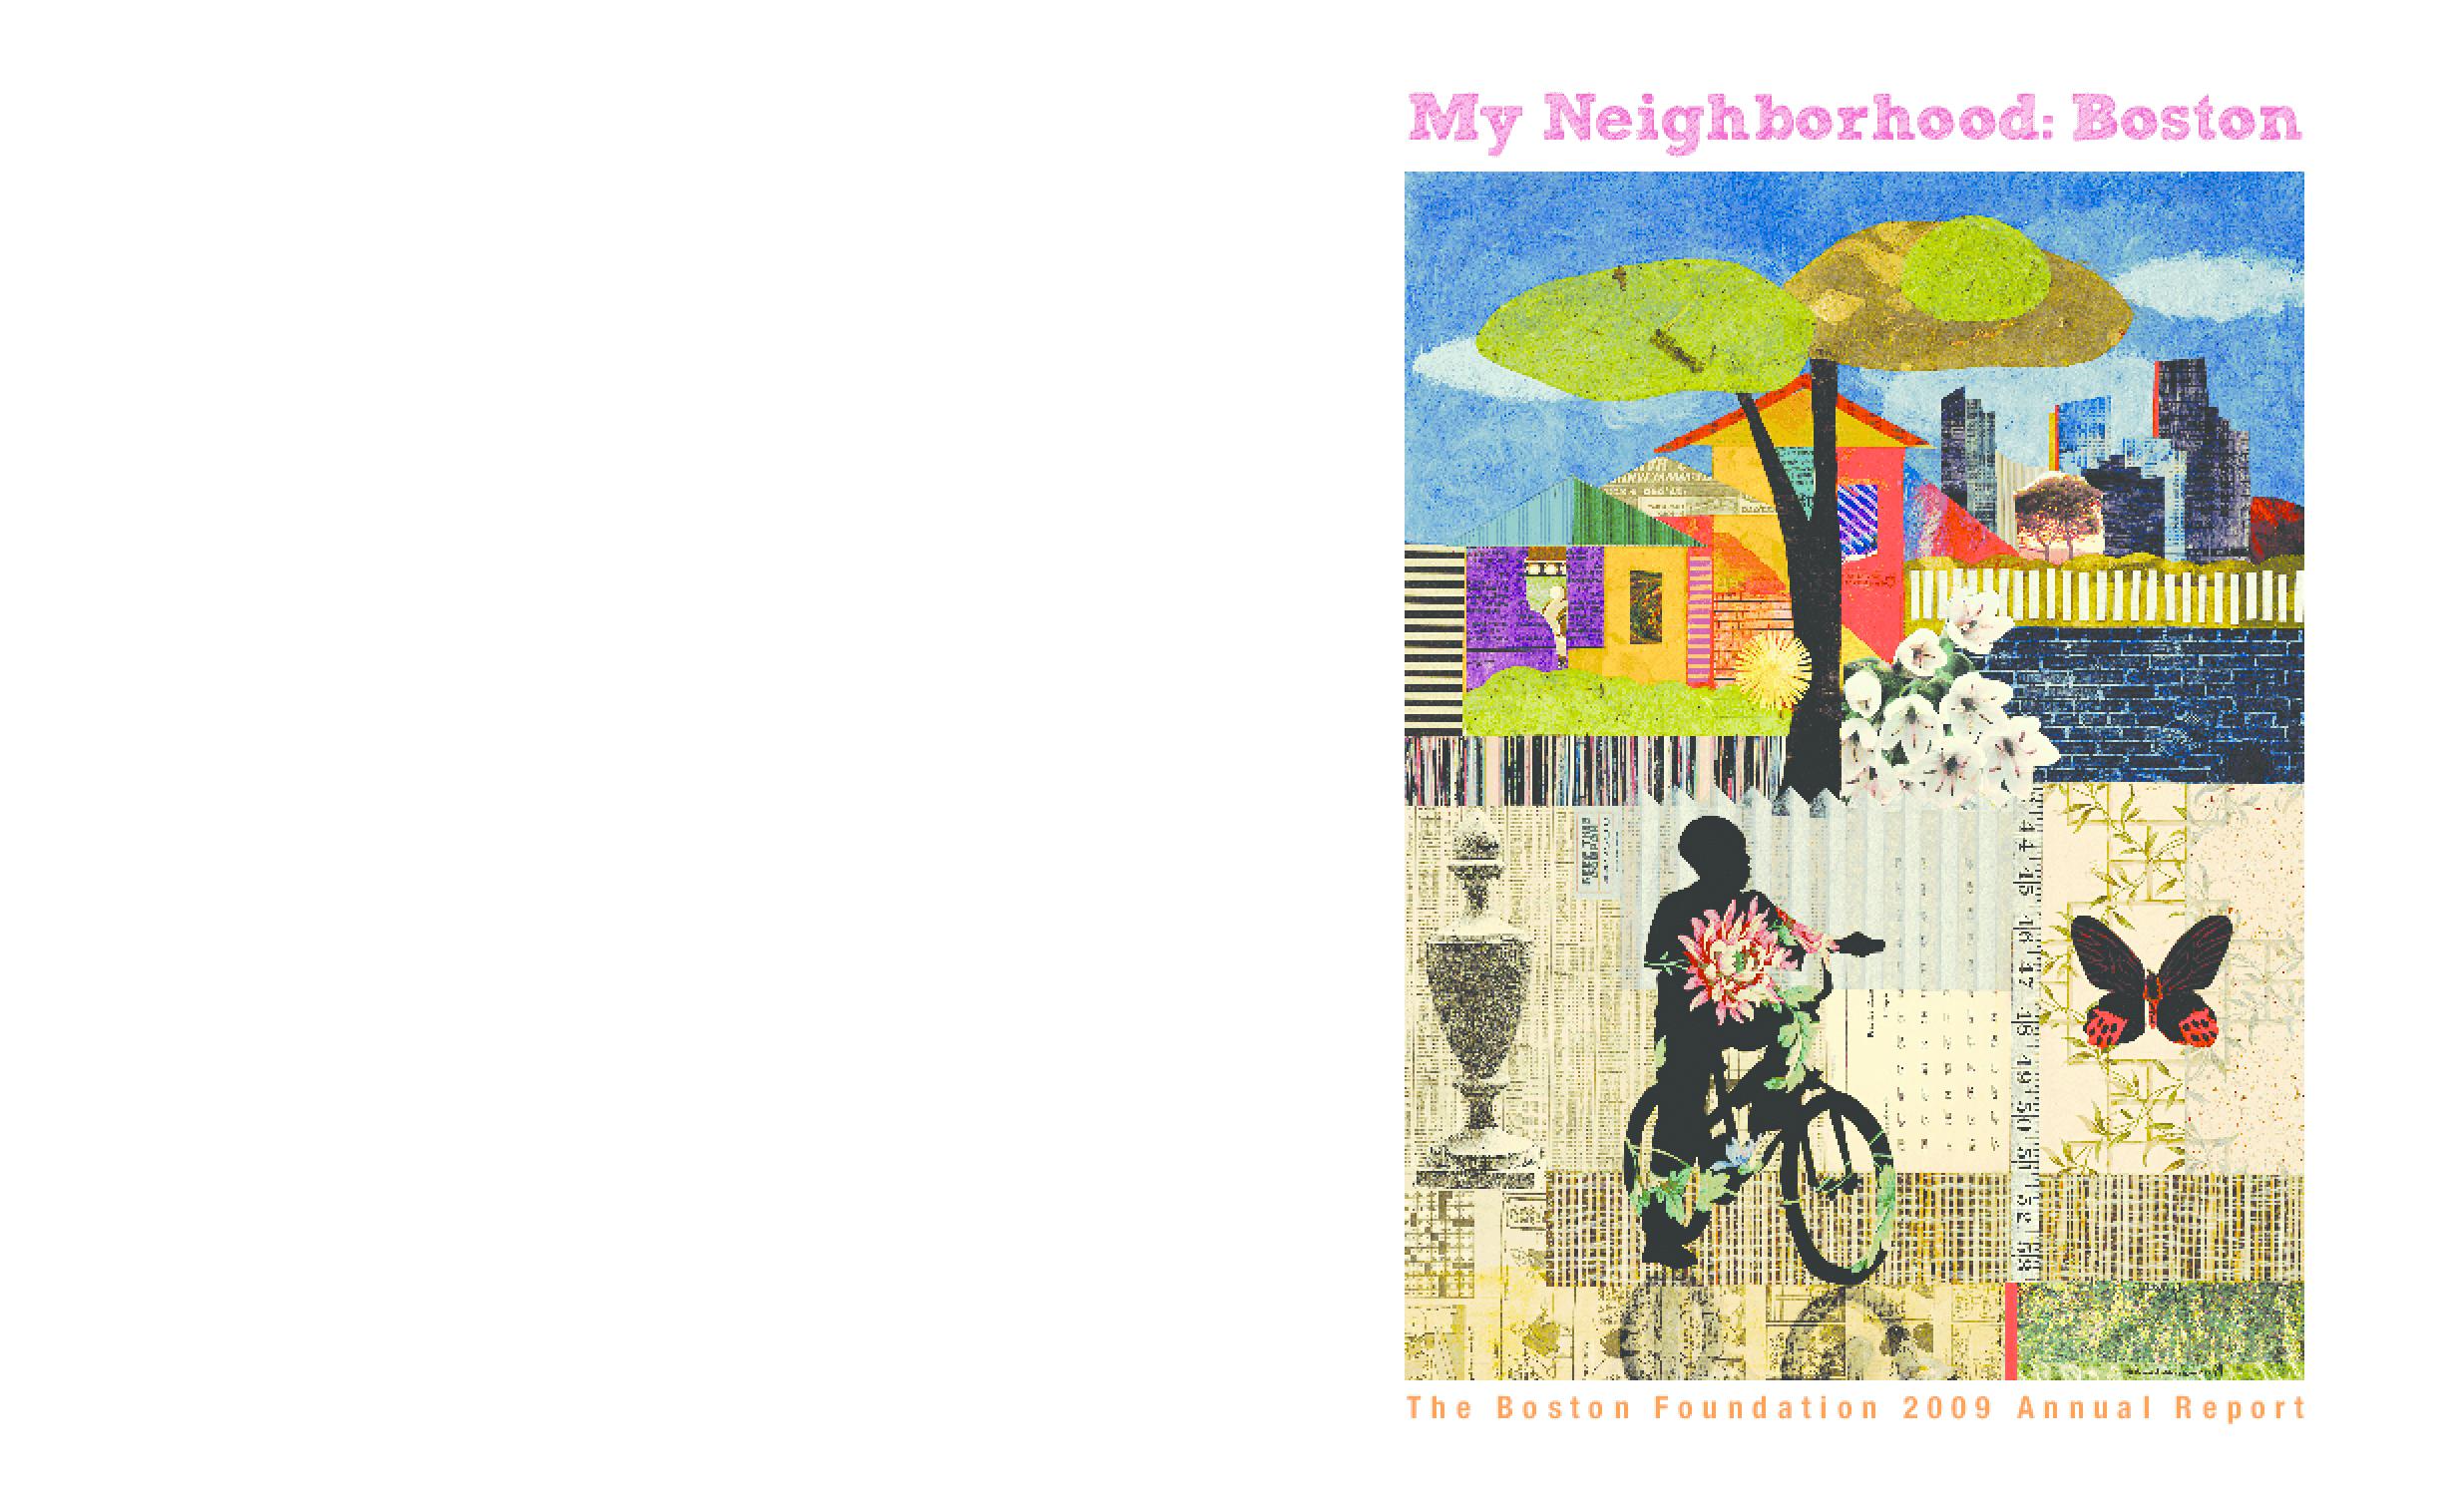 Boston Foundation - 2009 Annual Report: My Neighborhood: Boston